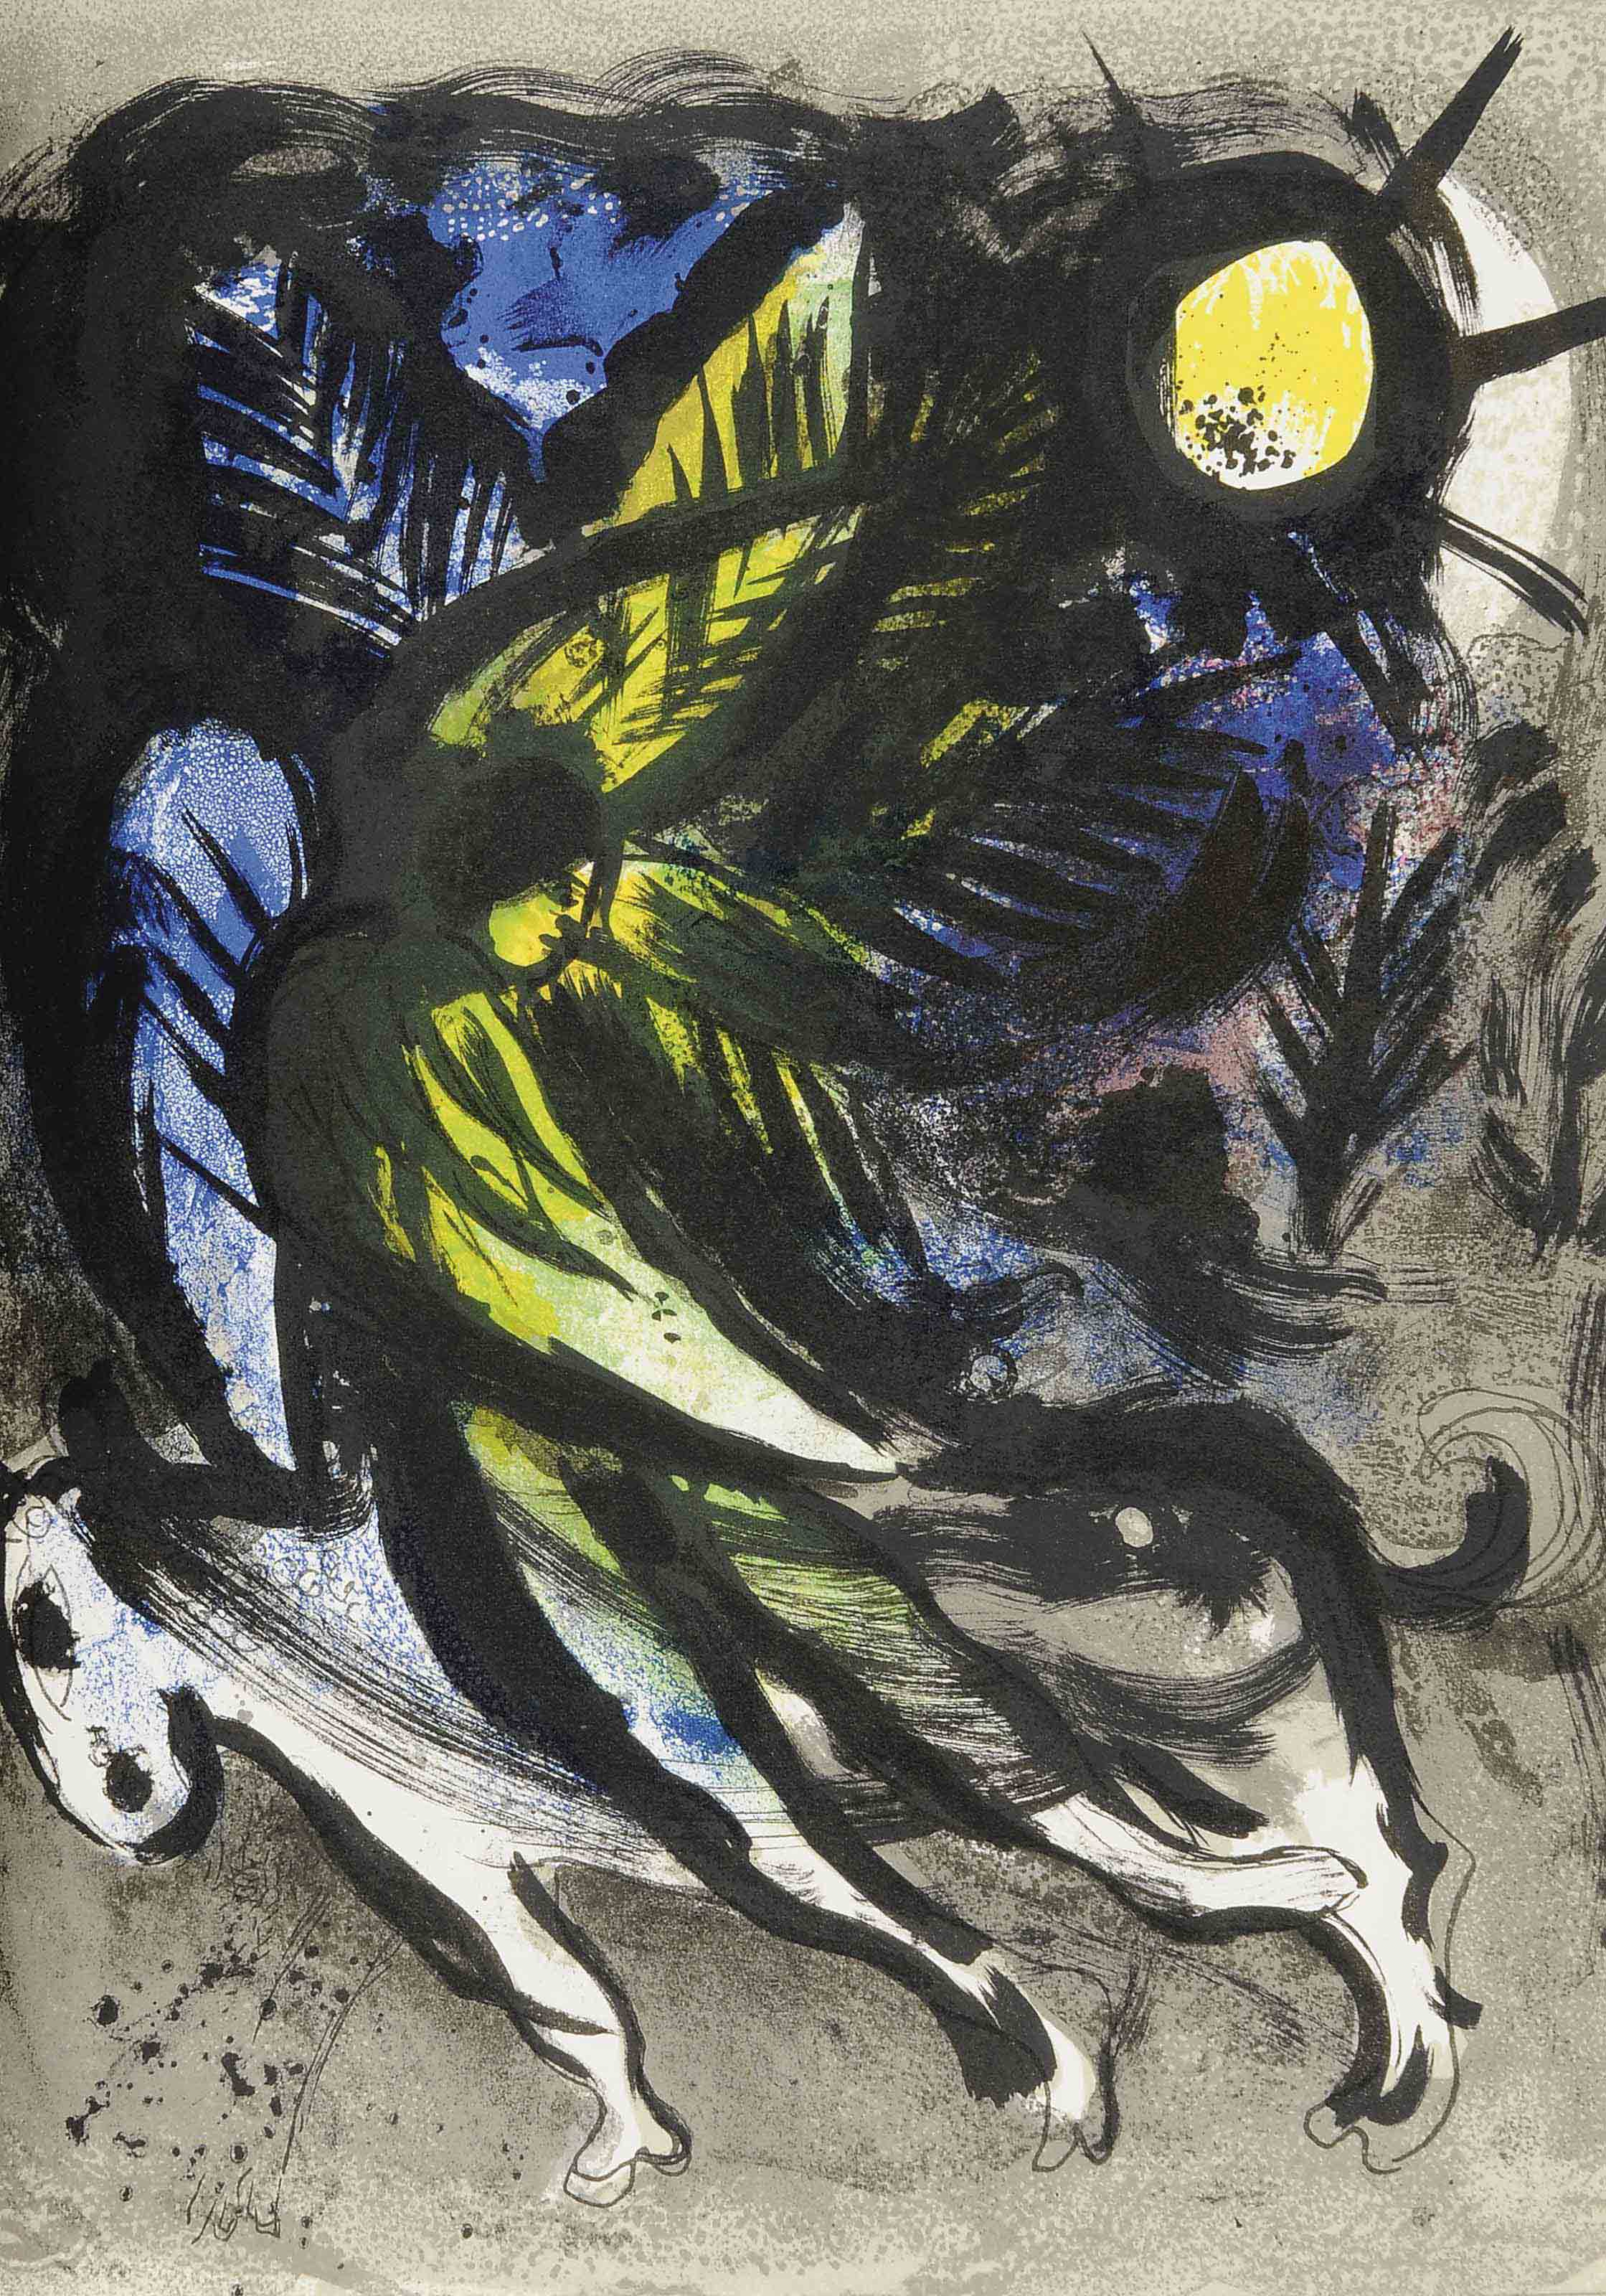 Marc Chagall (1885-1985)